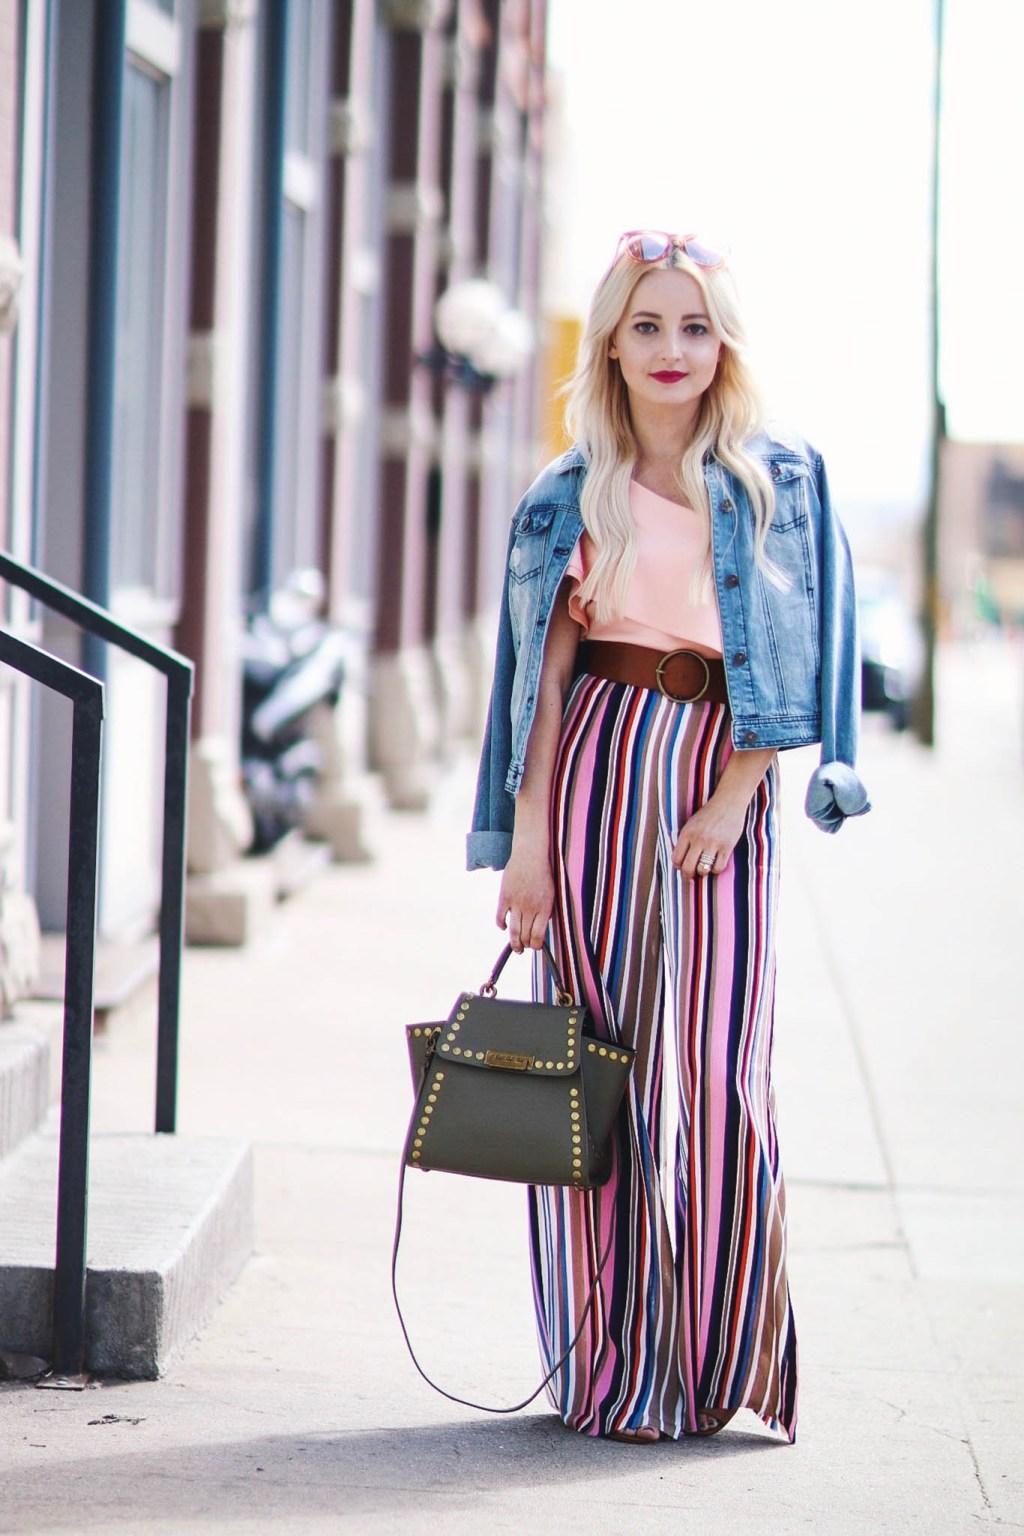 Alena Gidenko of modaprints.com shares a very chic look for Spring